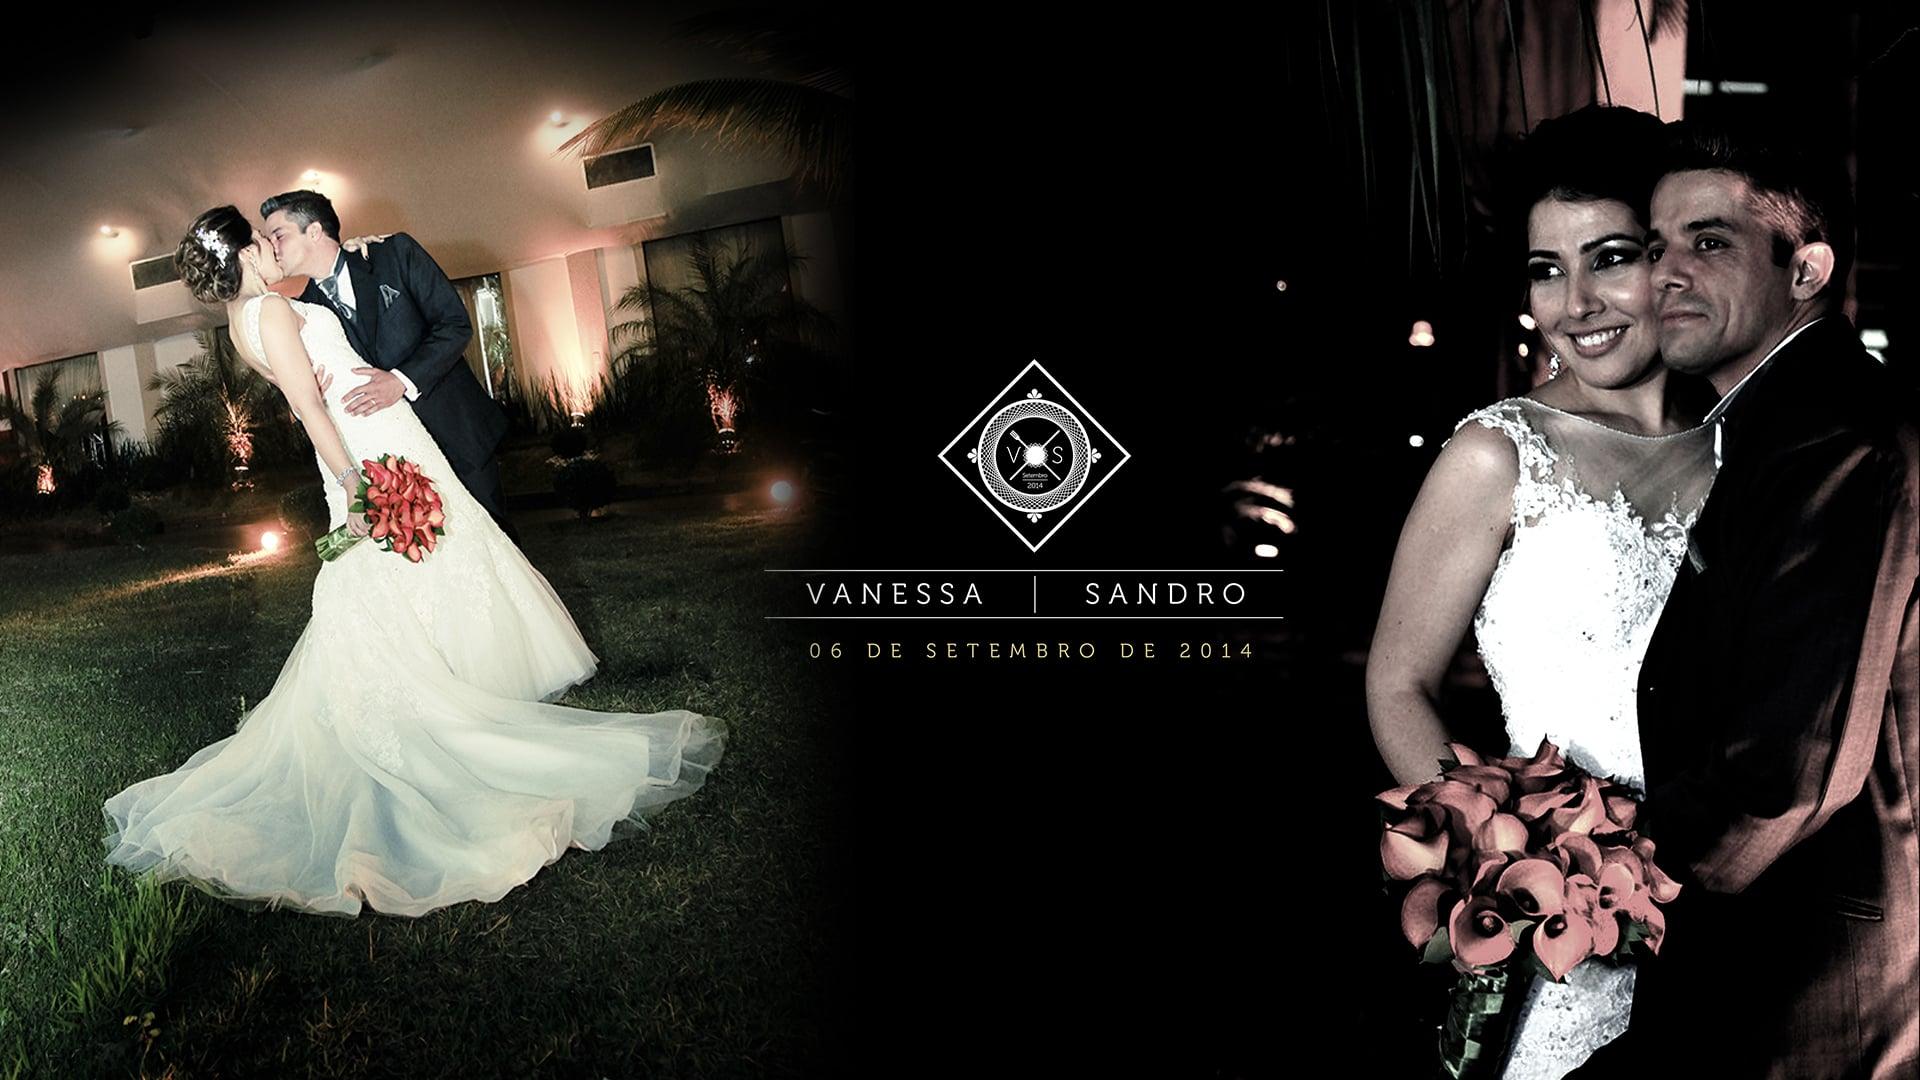 Teaser Vanessa e Sandro